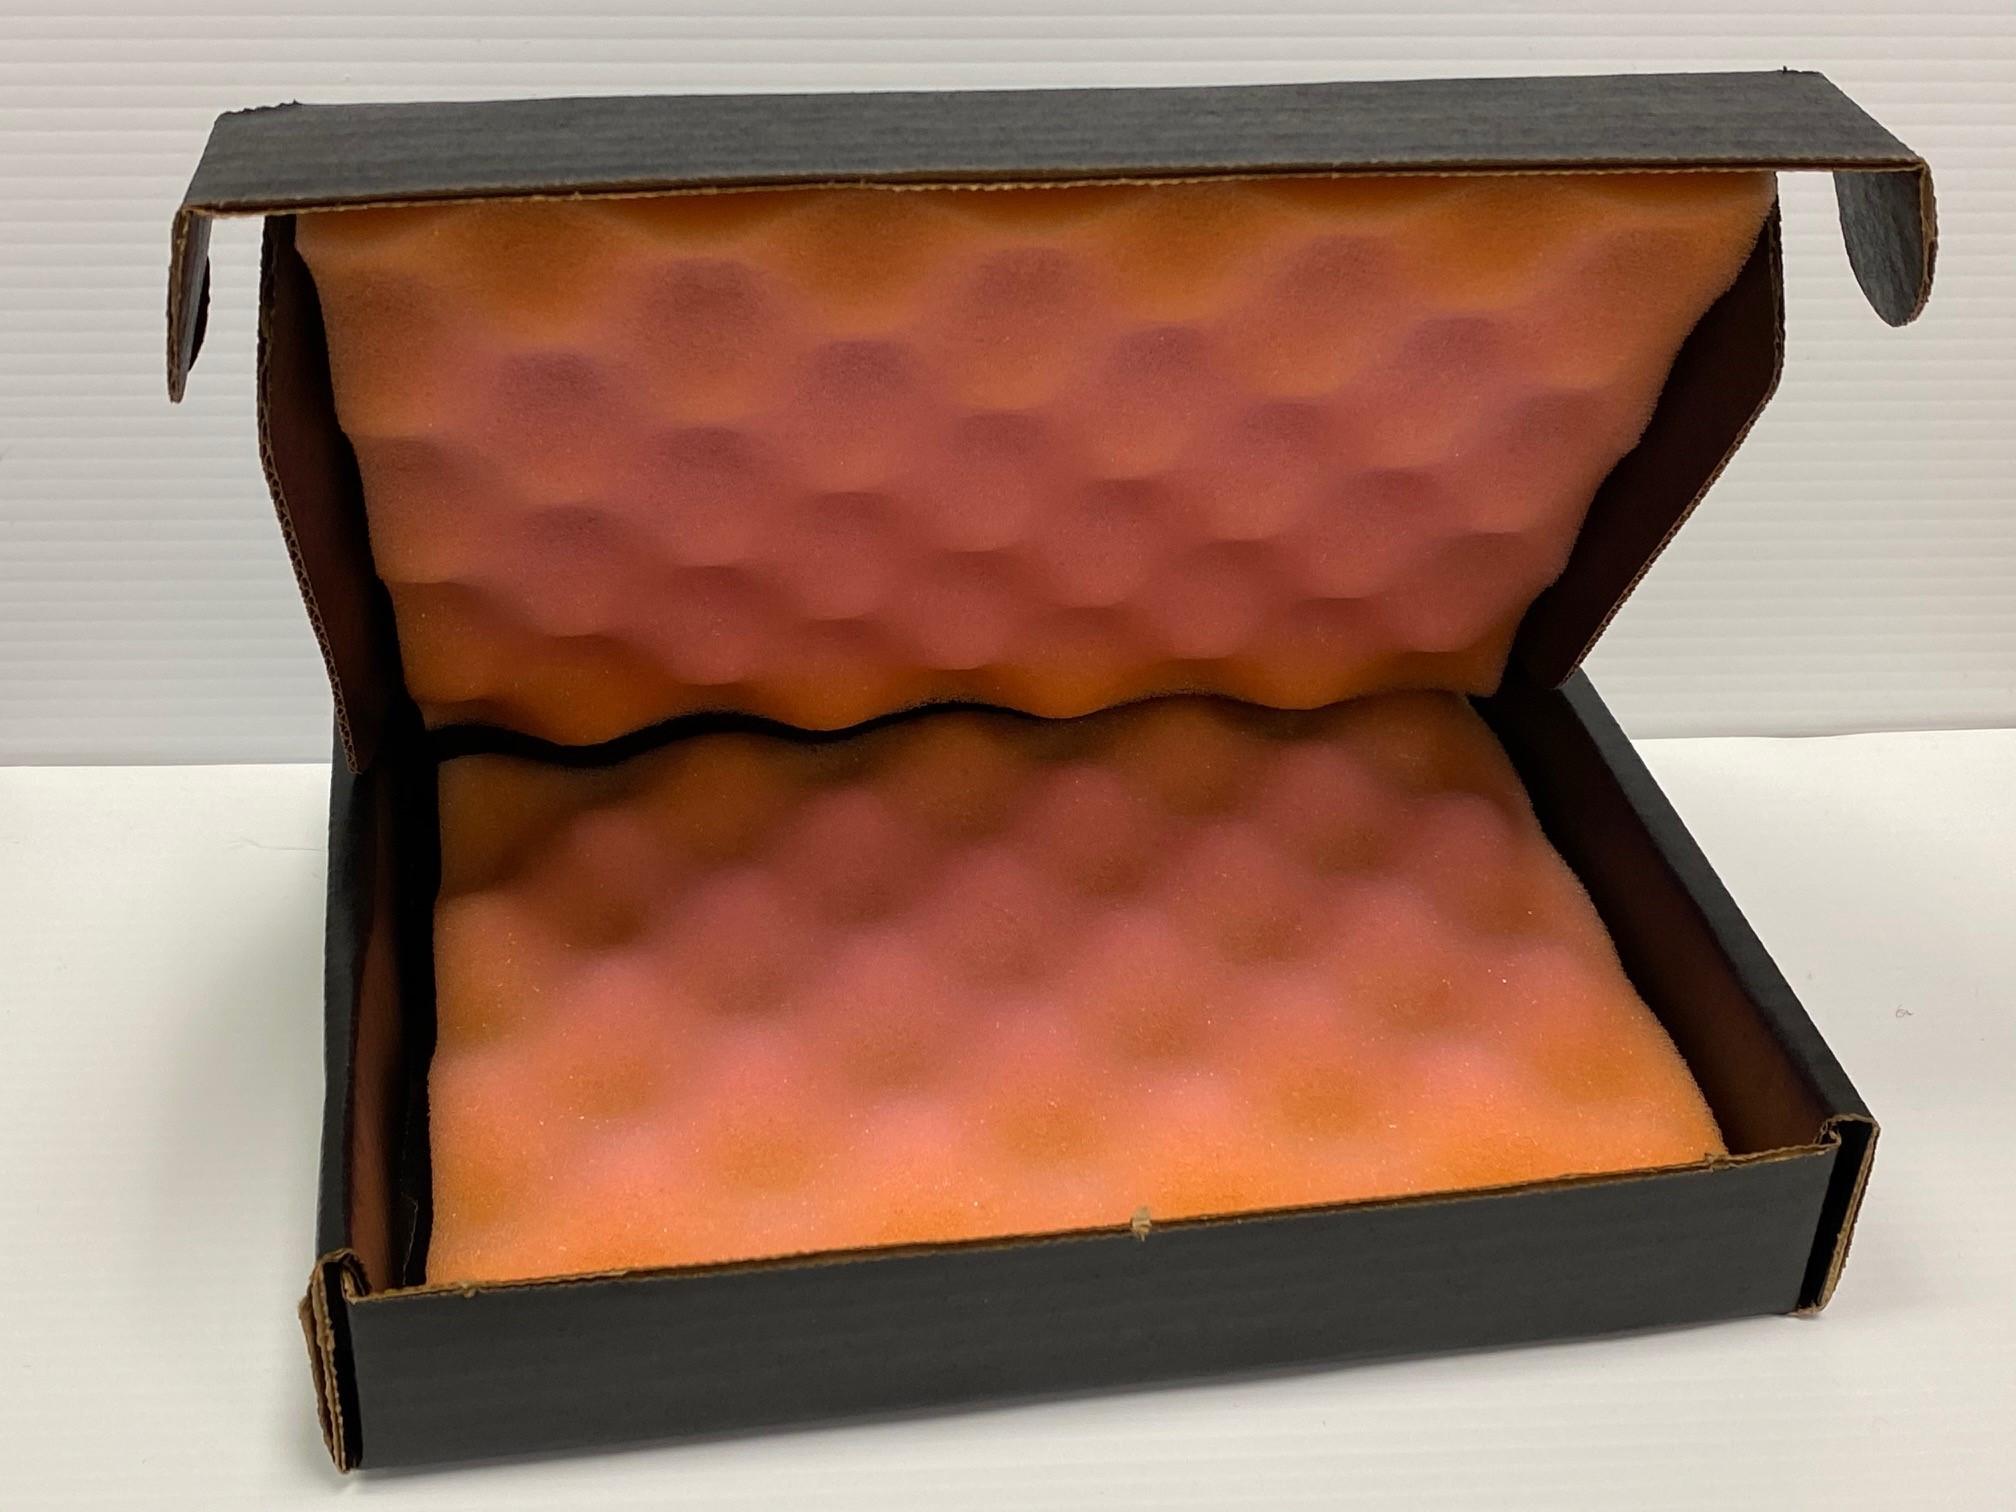 ESD cardboard1